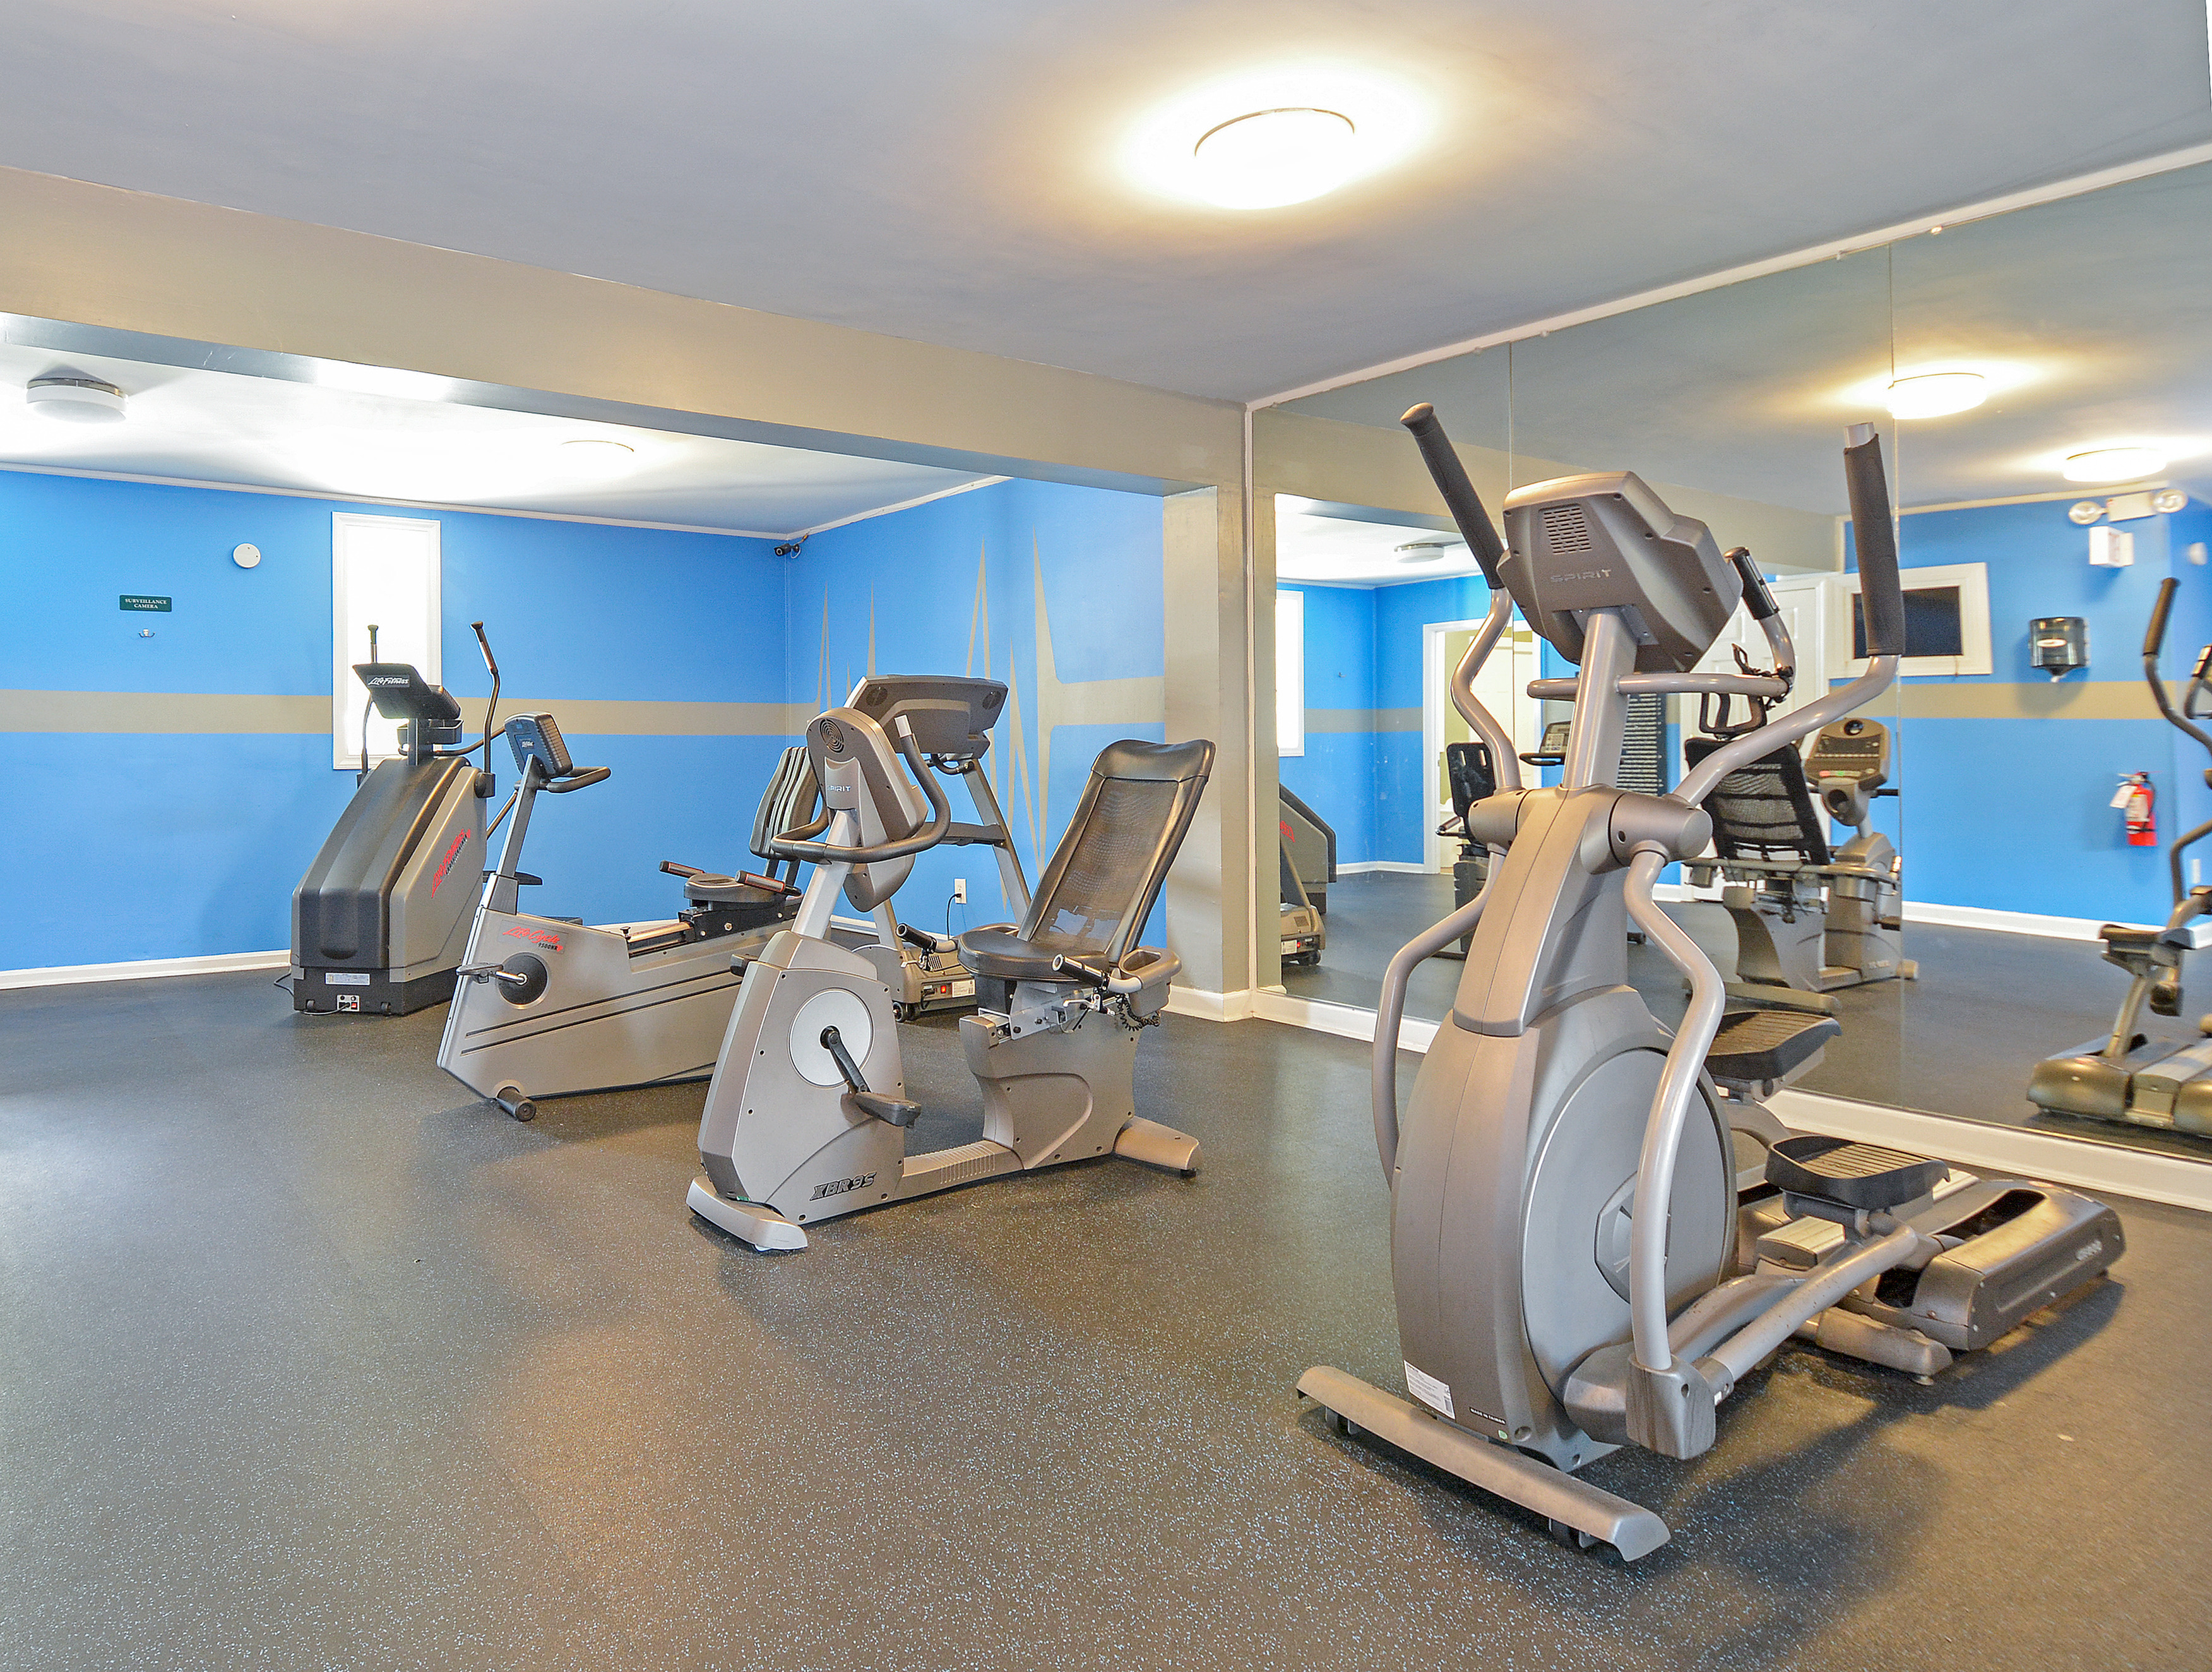 Fitness Center   Cardio Equipment   Park Place Apartments